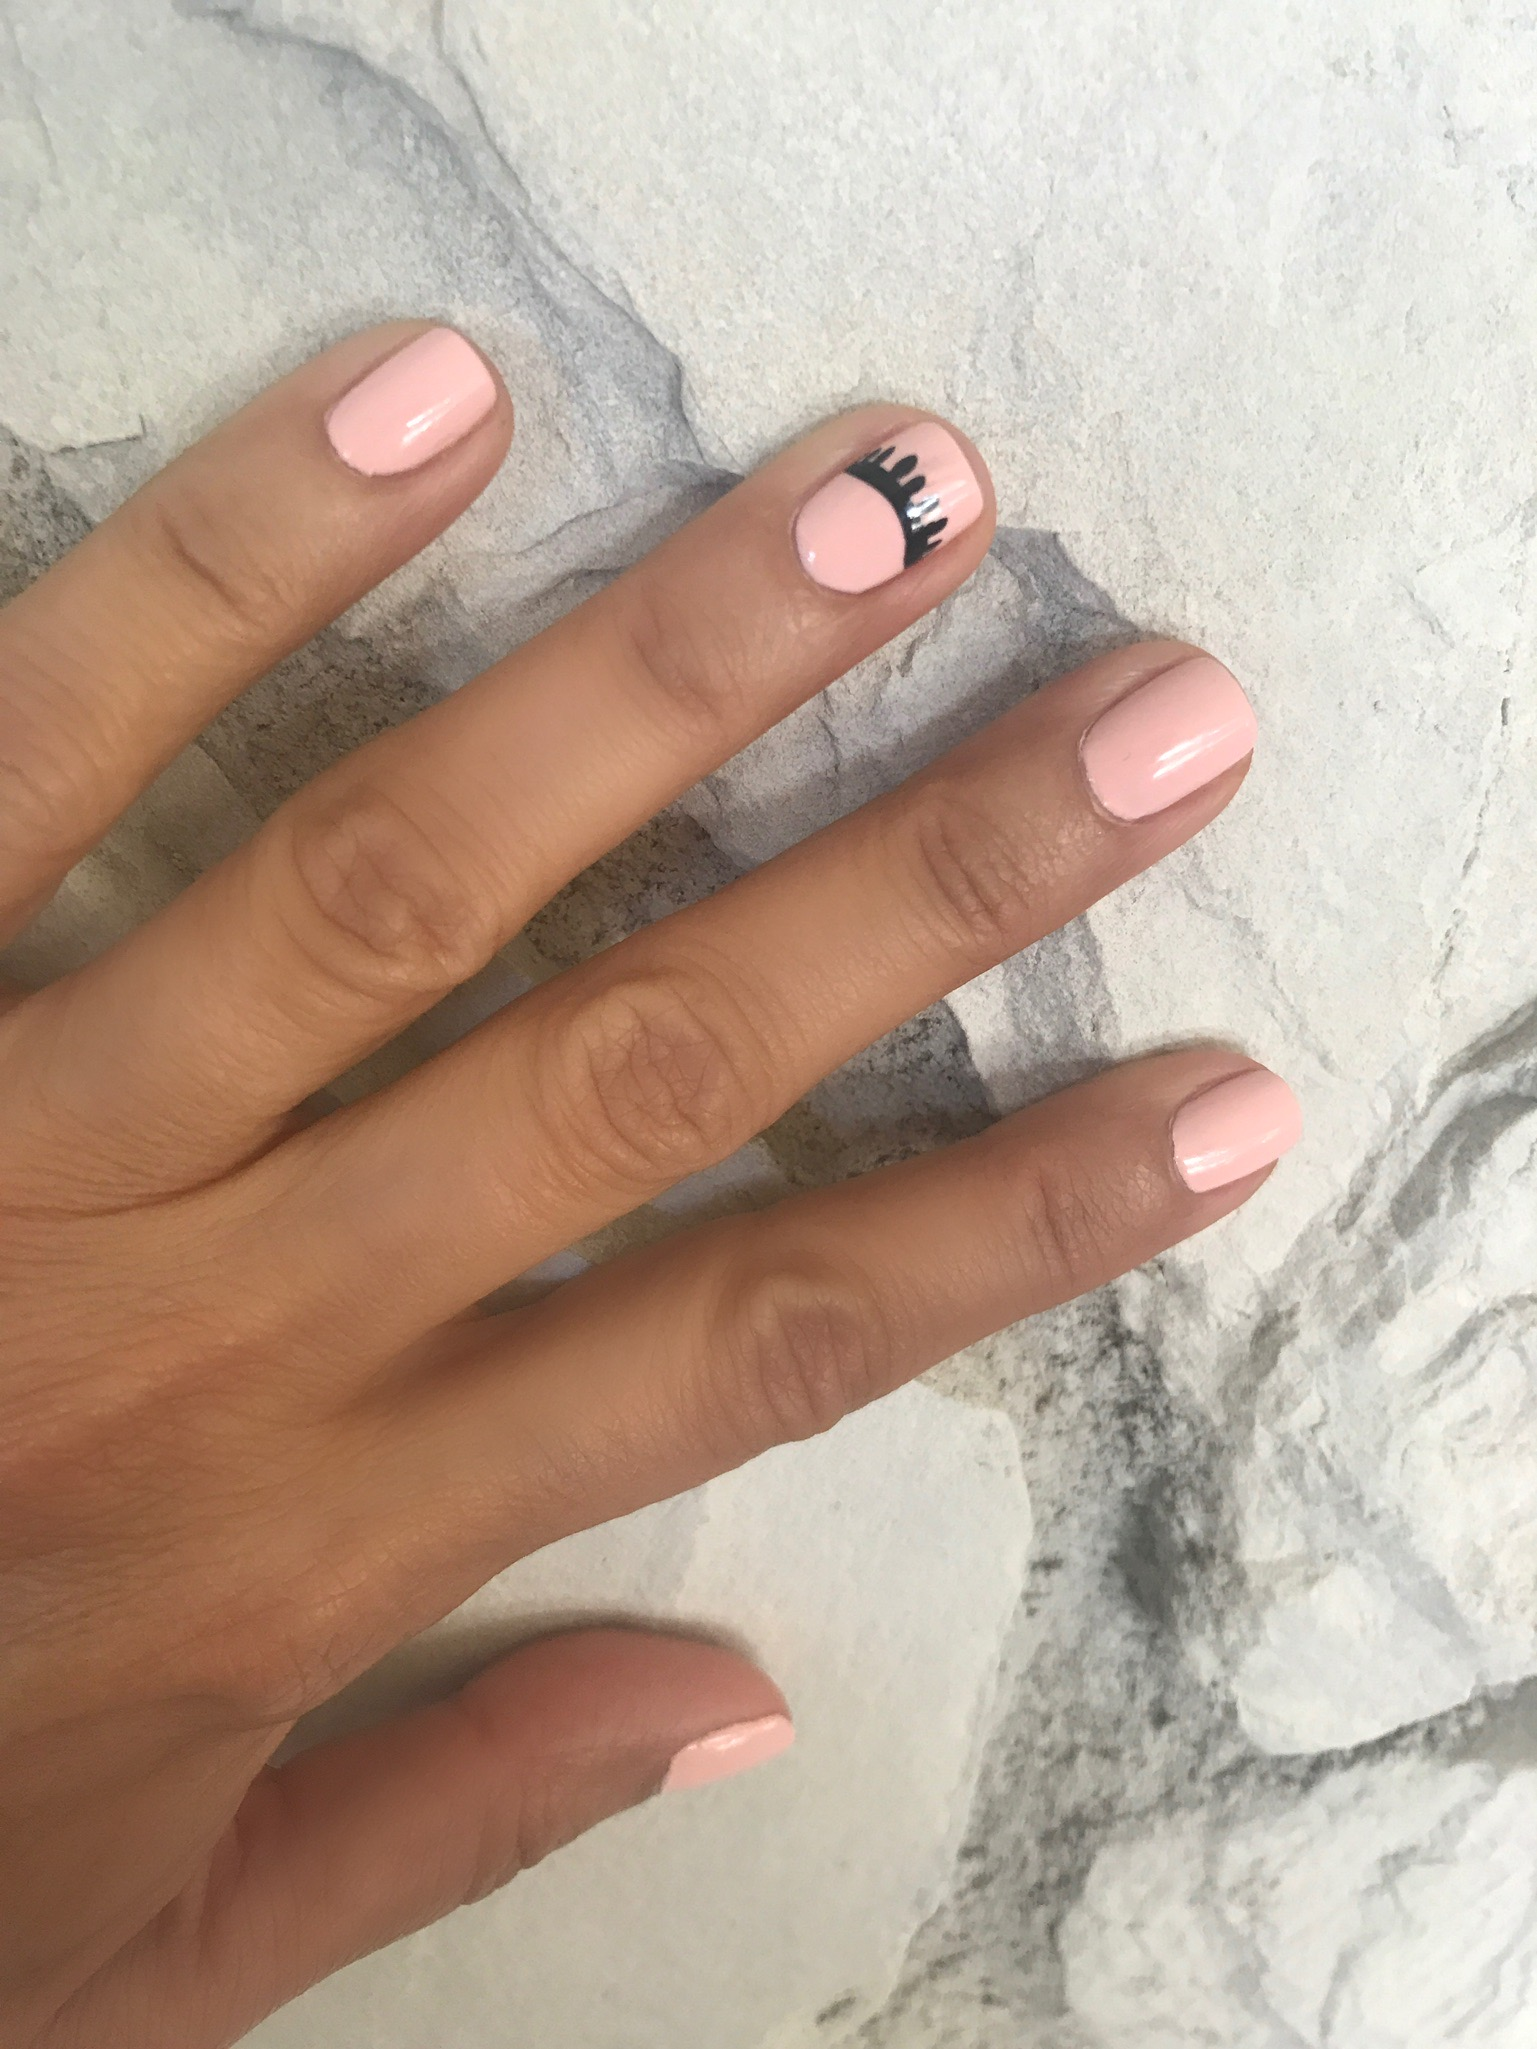 Melissa Meyers + Mani Monday + essie nail